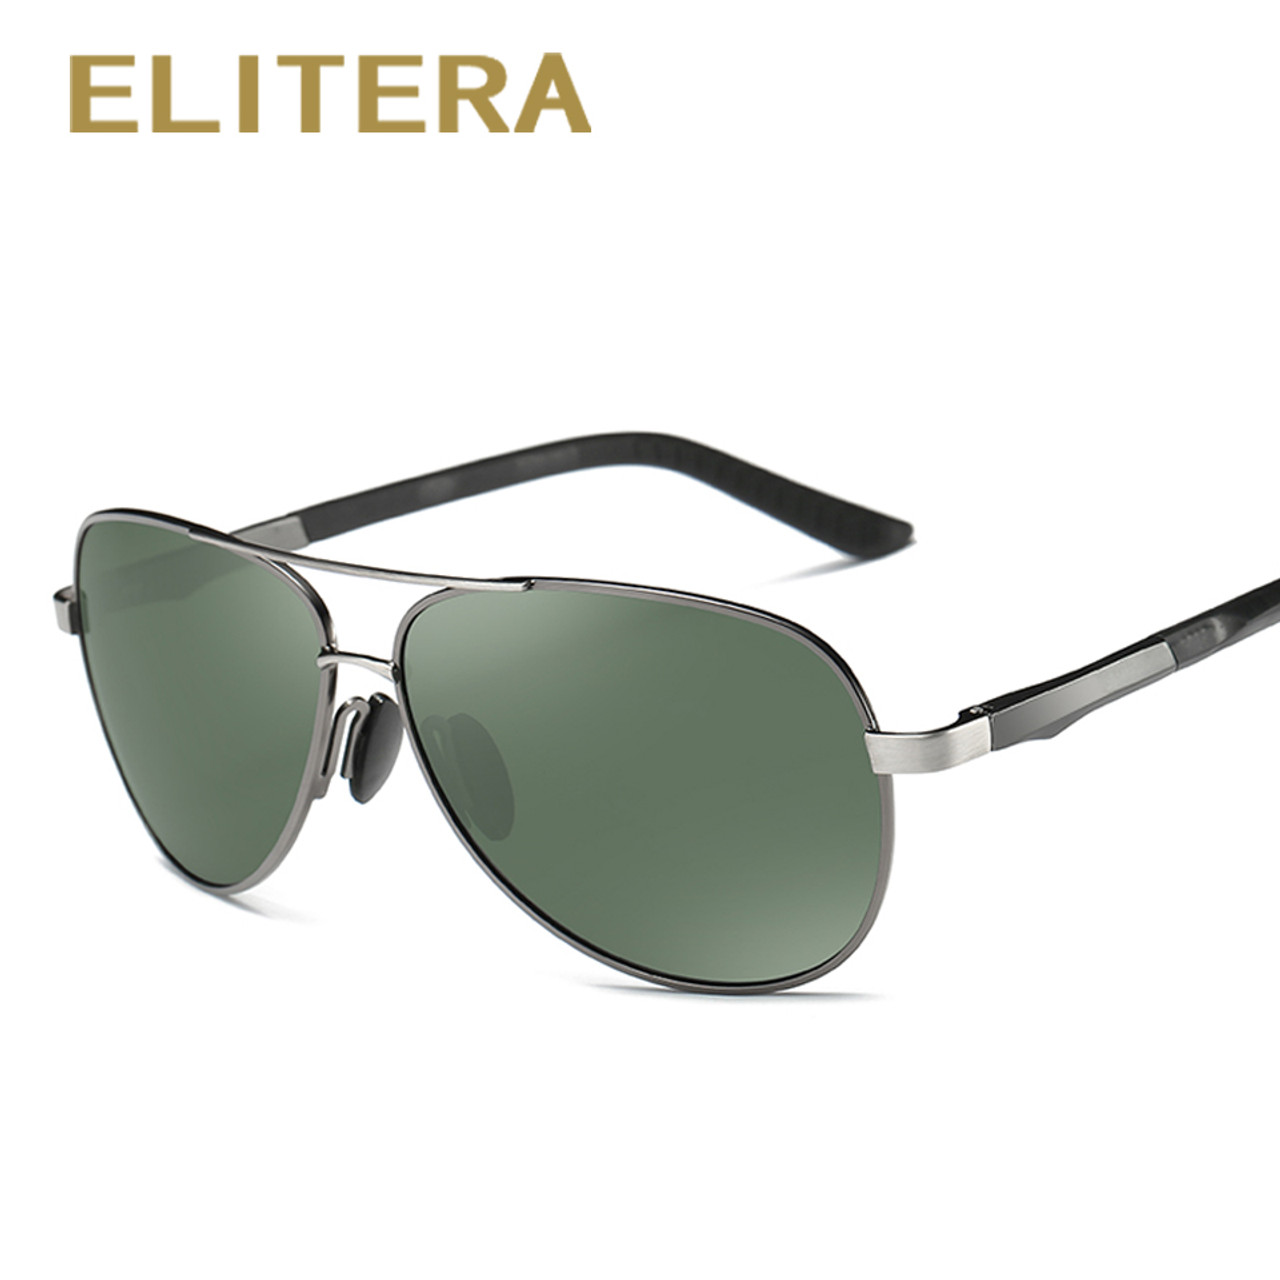 c63431d9aab ... ELITERA Aluminum Magnesium Brand Polarized Sunglasses Men New Design  Fishing Driving Sun Glasses Eyewear Oculos Gafas ...